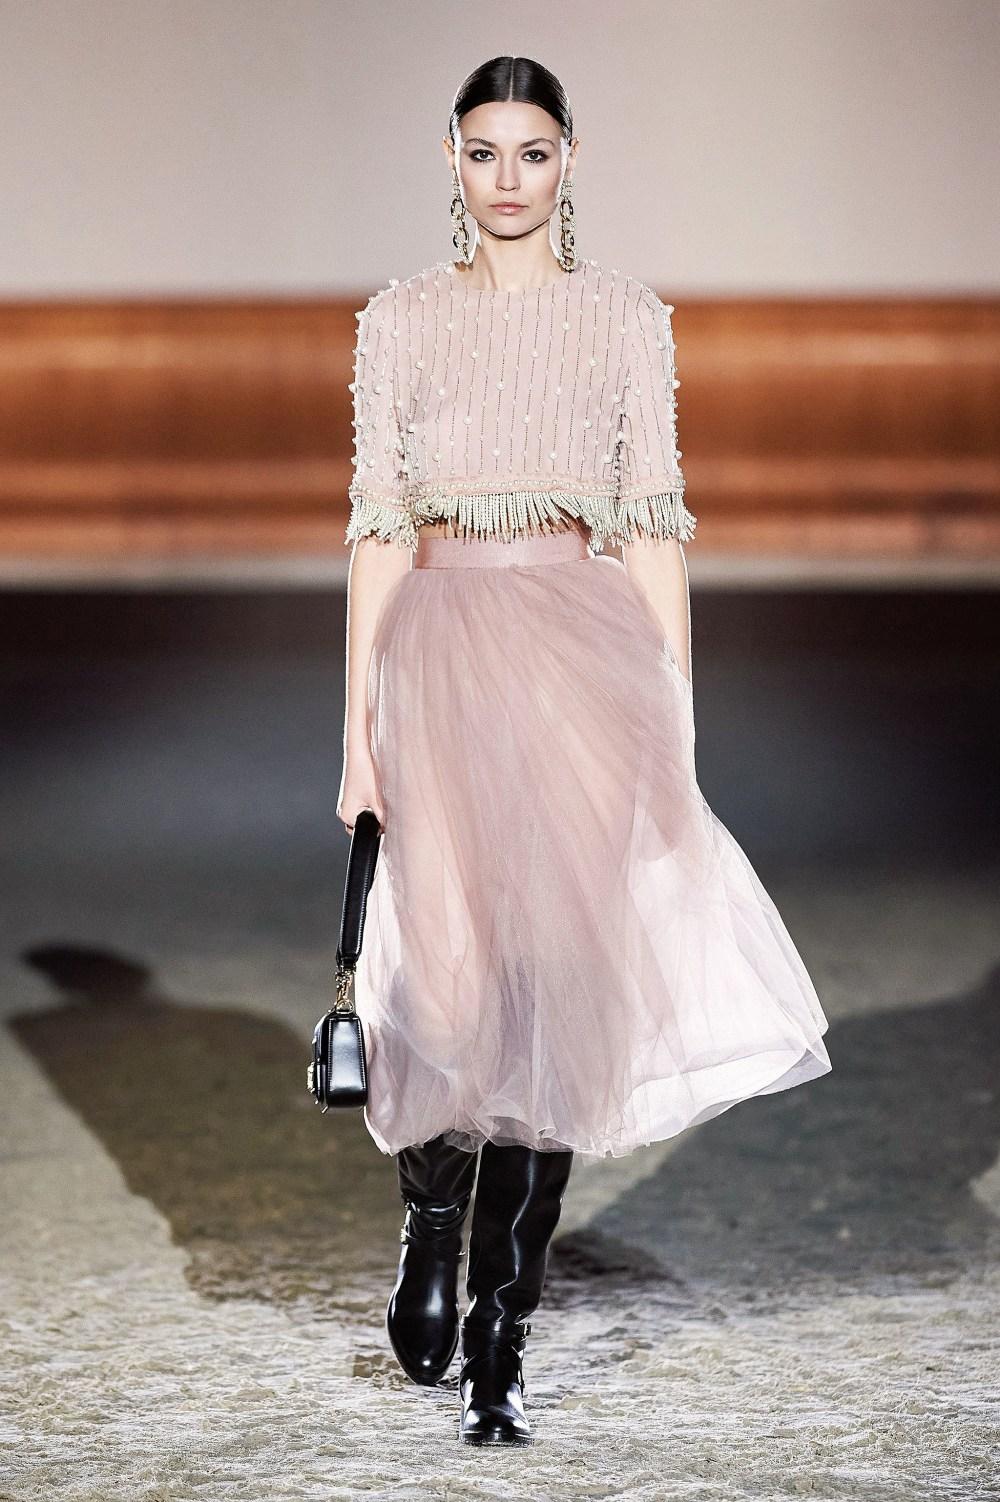 Elisabetta Franchi: Elisabetta Franchi Fall Winter 2021-22 Fashion Show Photo #25